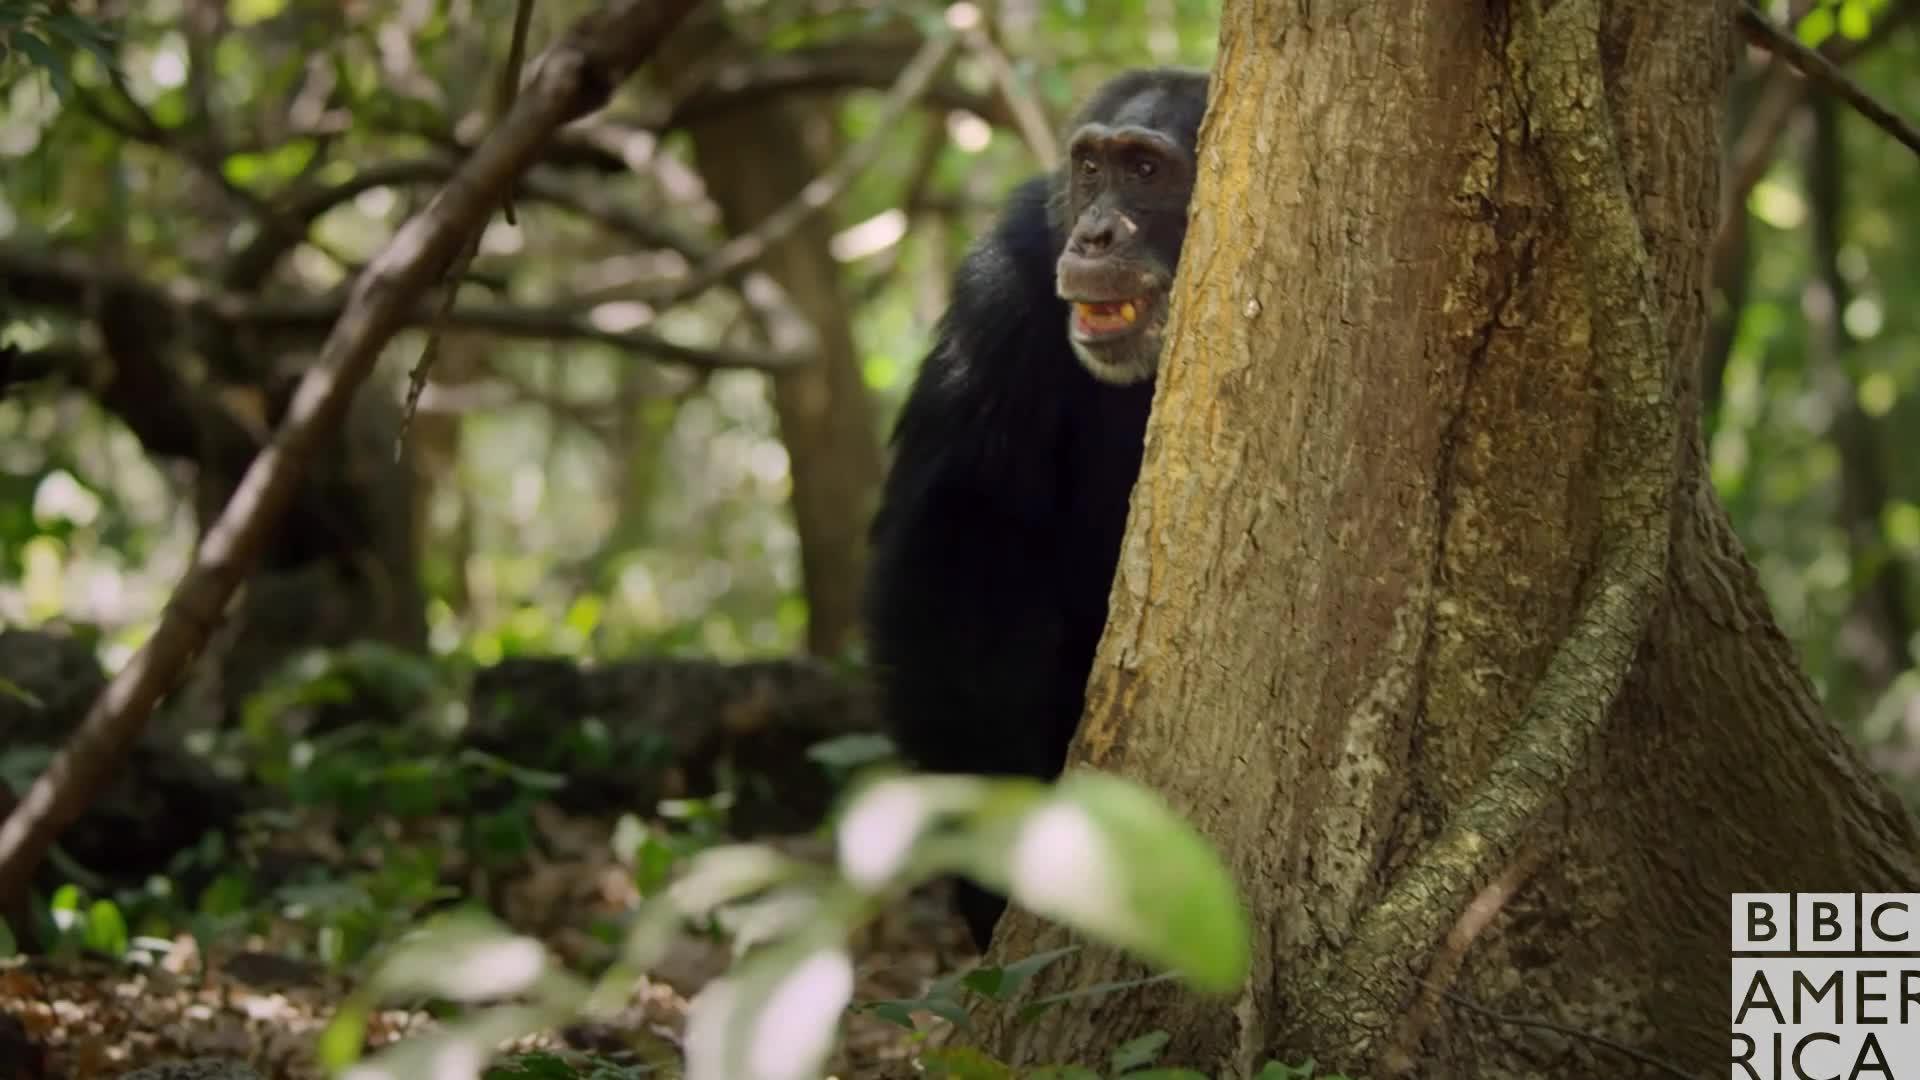 animal, animals, bbc america, bbc america dynasties, bbc america: dynasties, chimp, chimpanzee, chimpanzees, chimps, dynasties, Dynasties Chimp Yawn GIFs